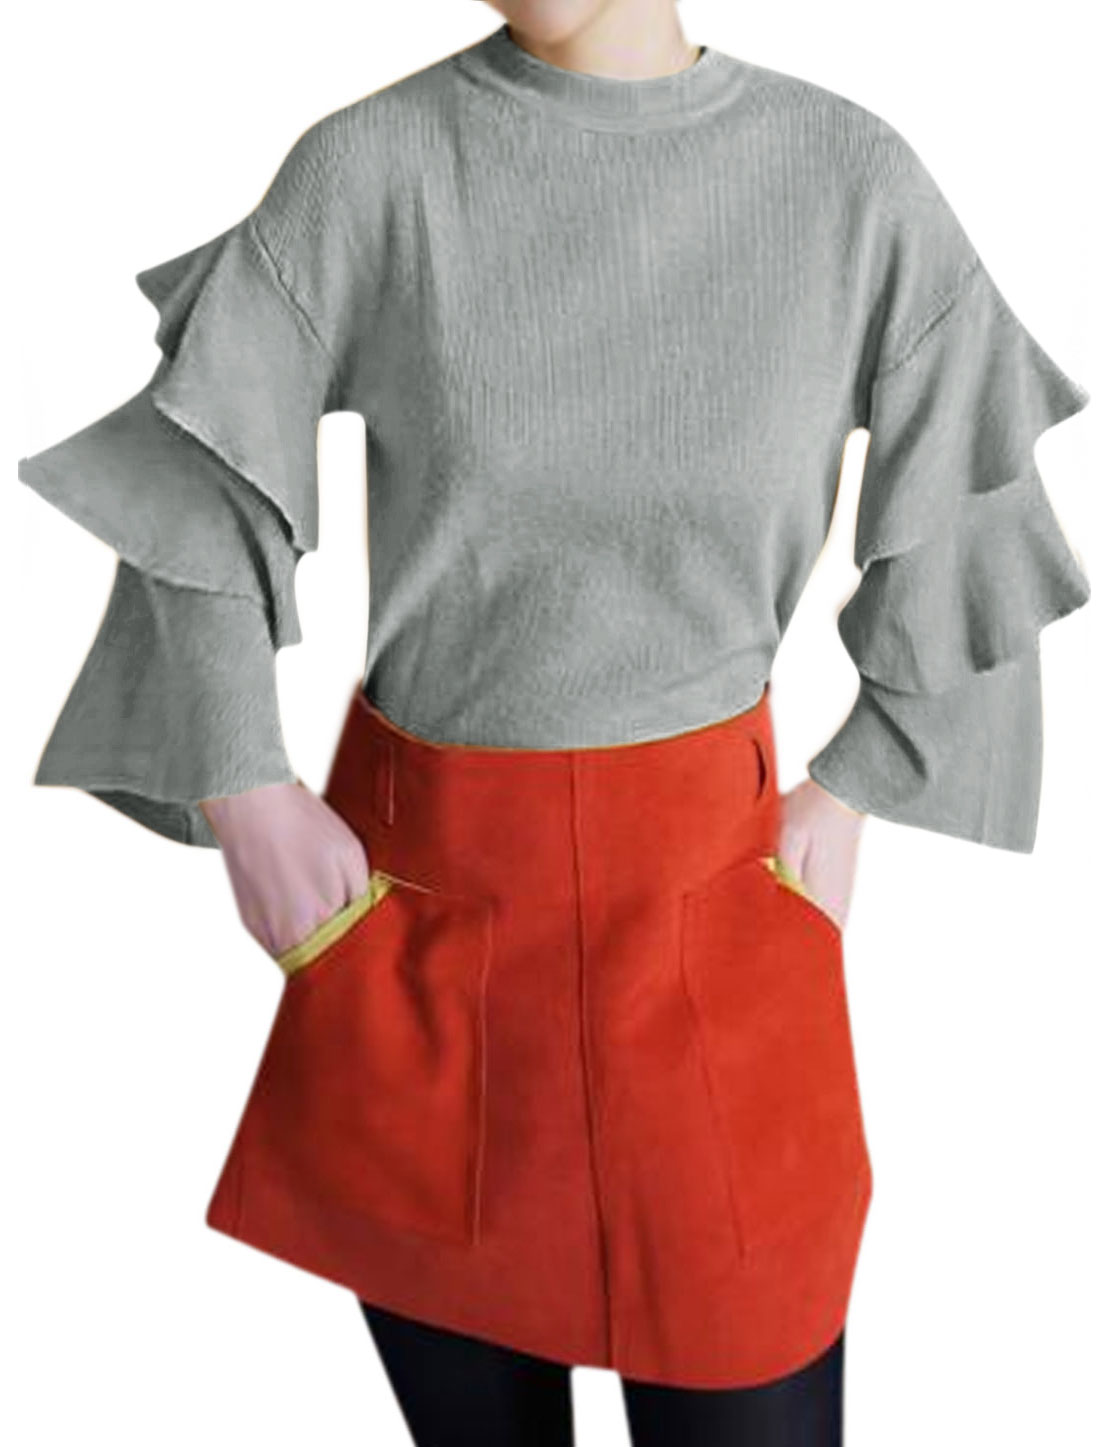 Women Crew Neck Tiered Sleeves Drop Shoulder Slim Fit Knit Top Gray S